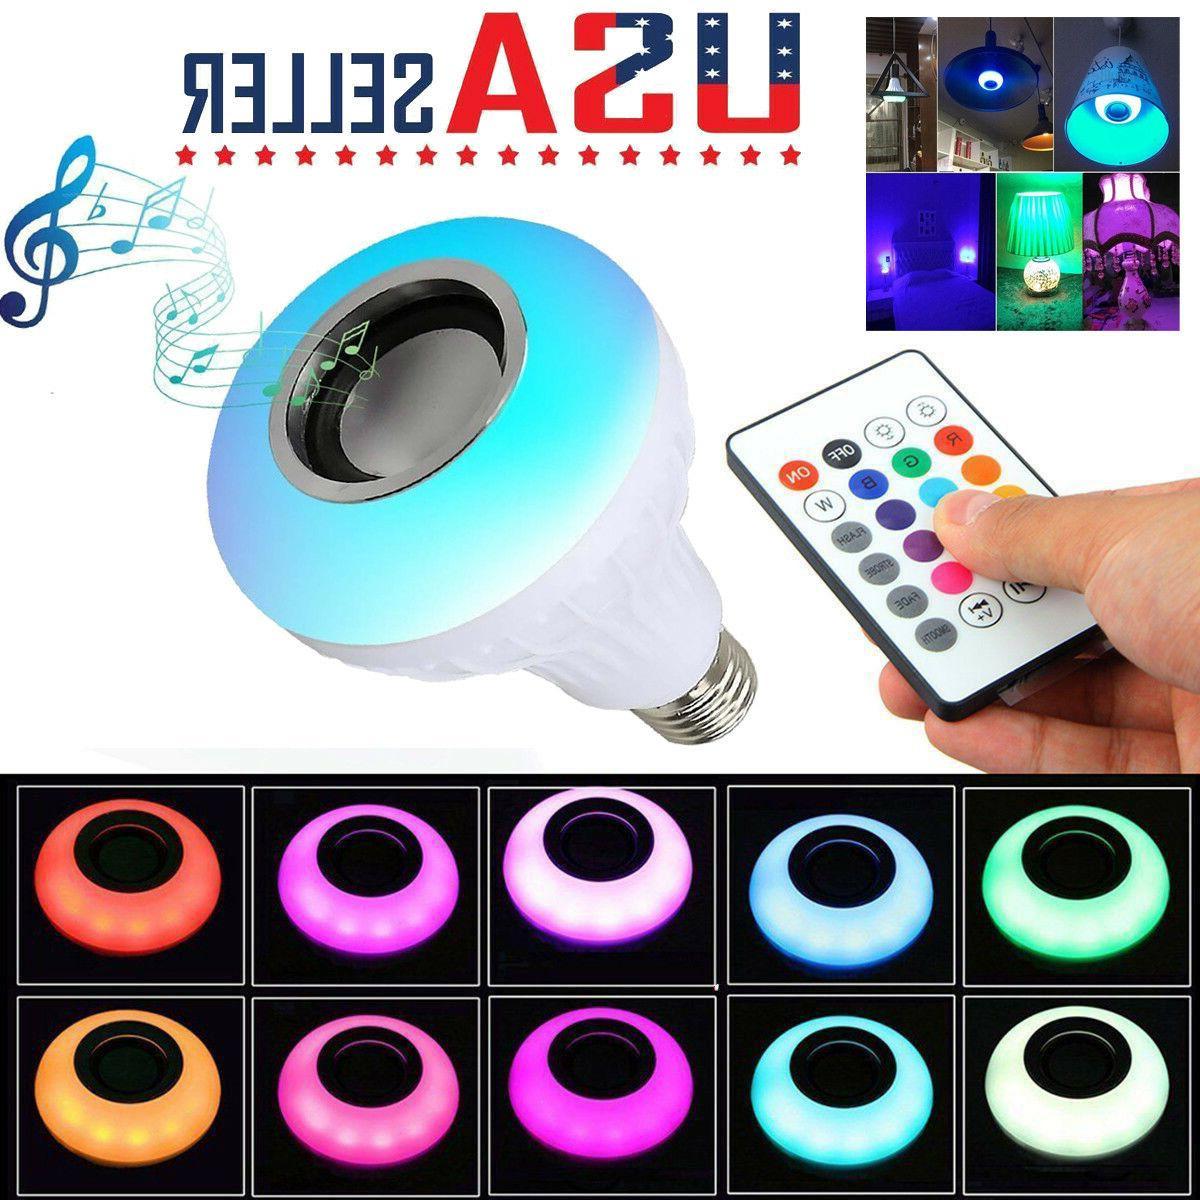 Bluetooth Speaker Wireless Music Player with Remote 12W RGB